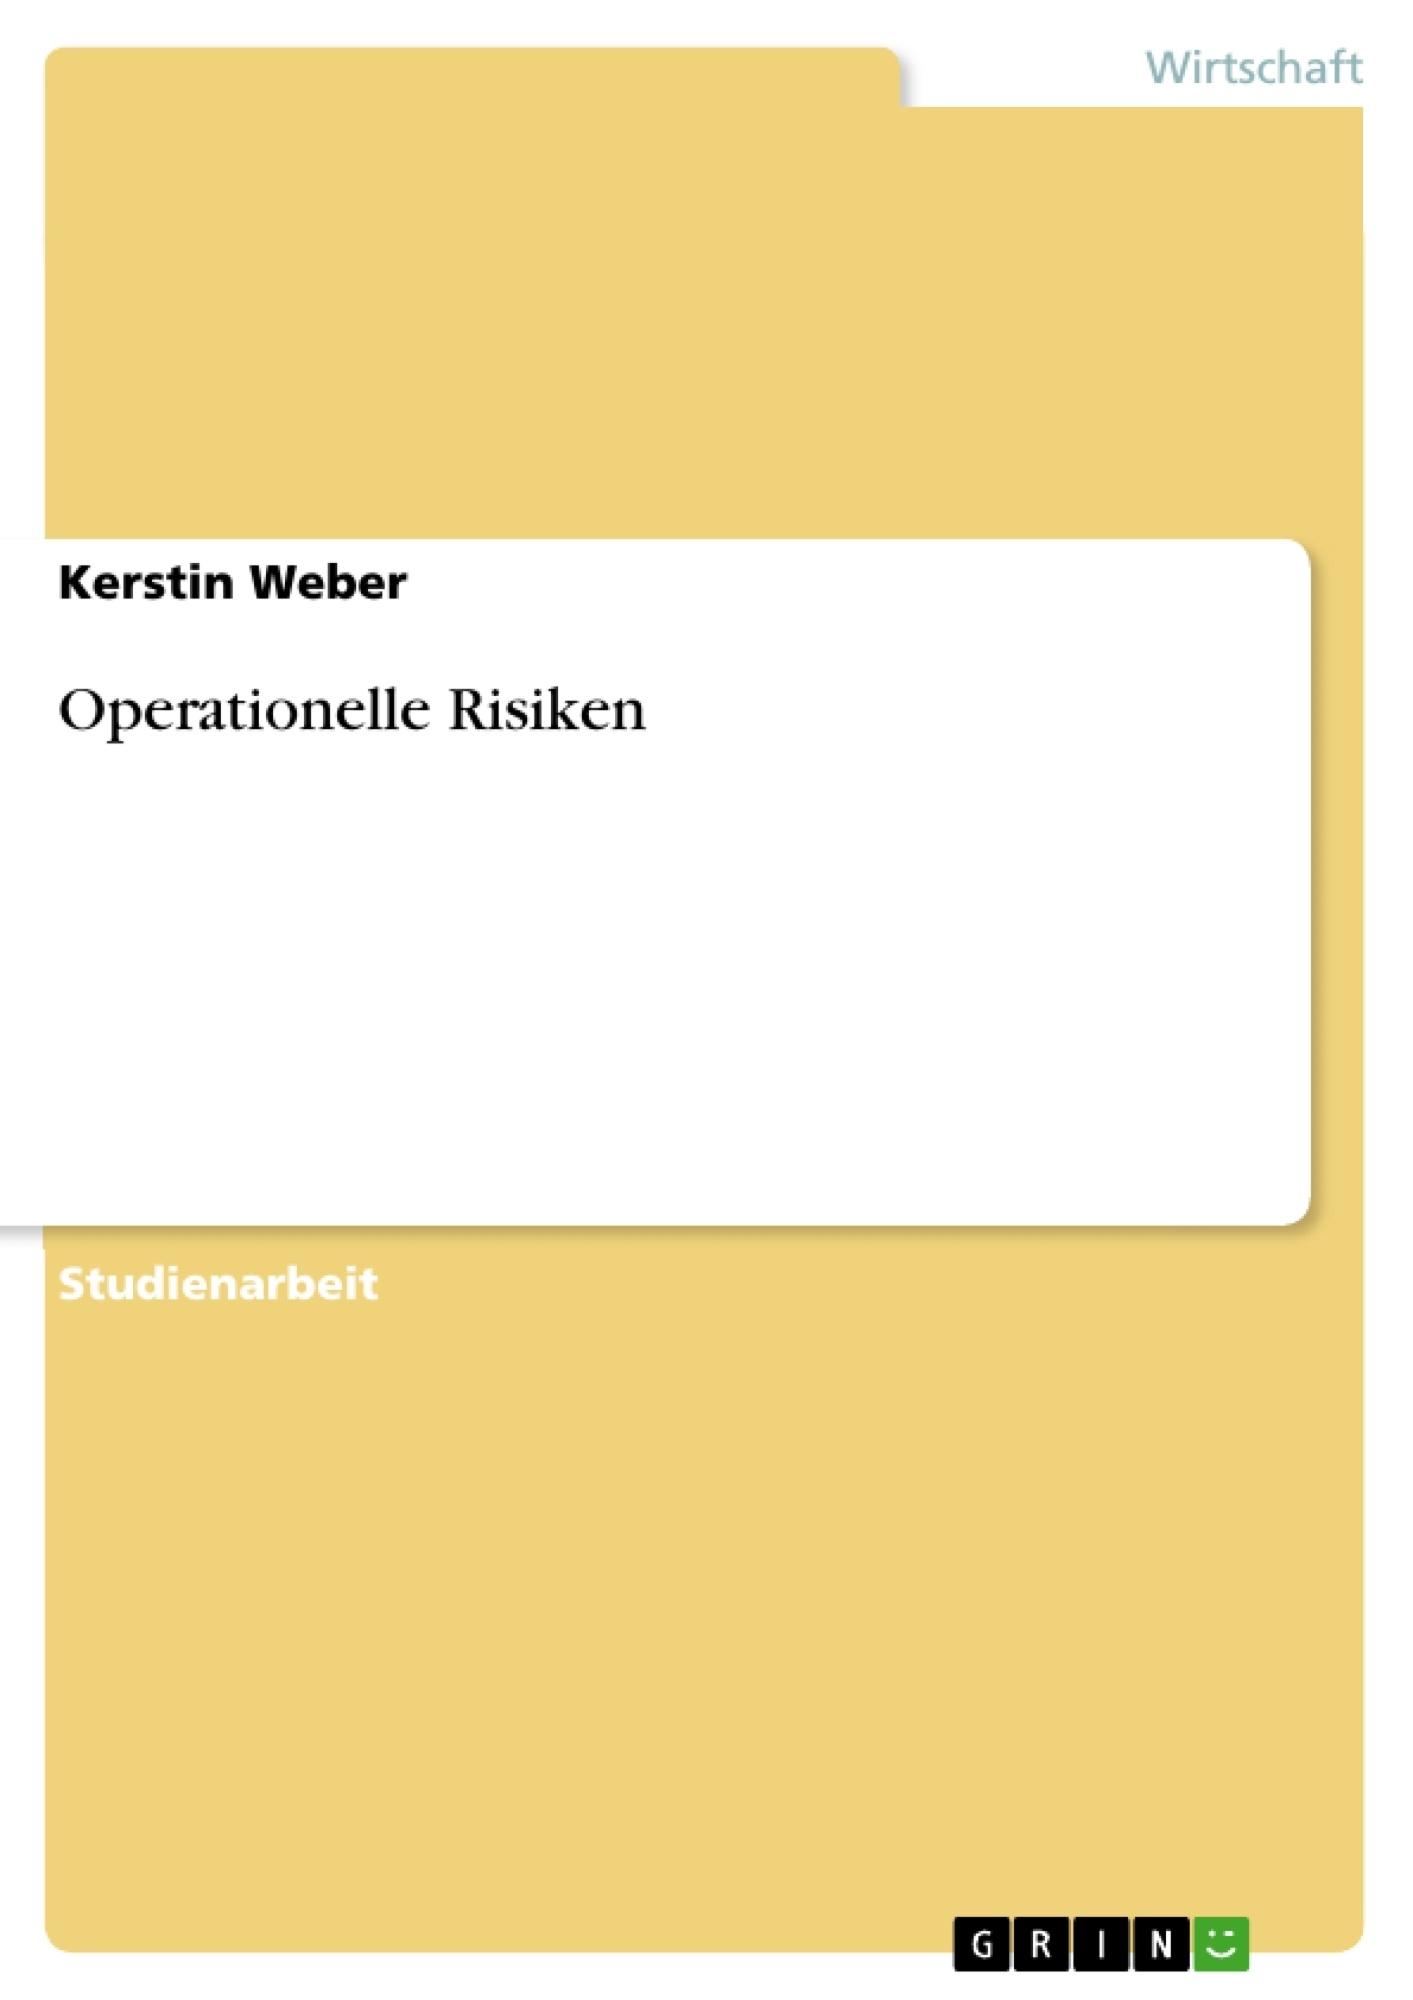 Titel: Operationelle Risiken